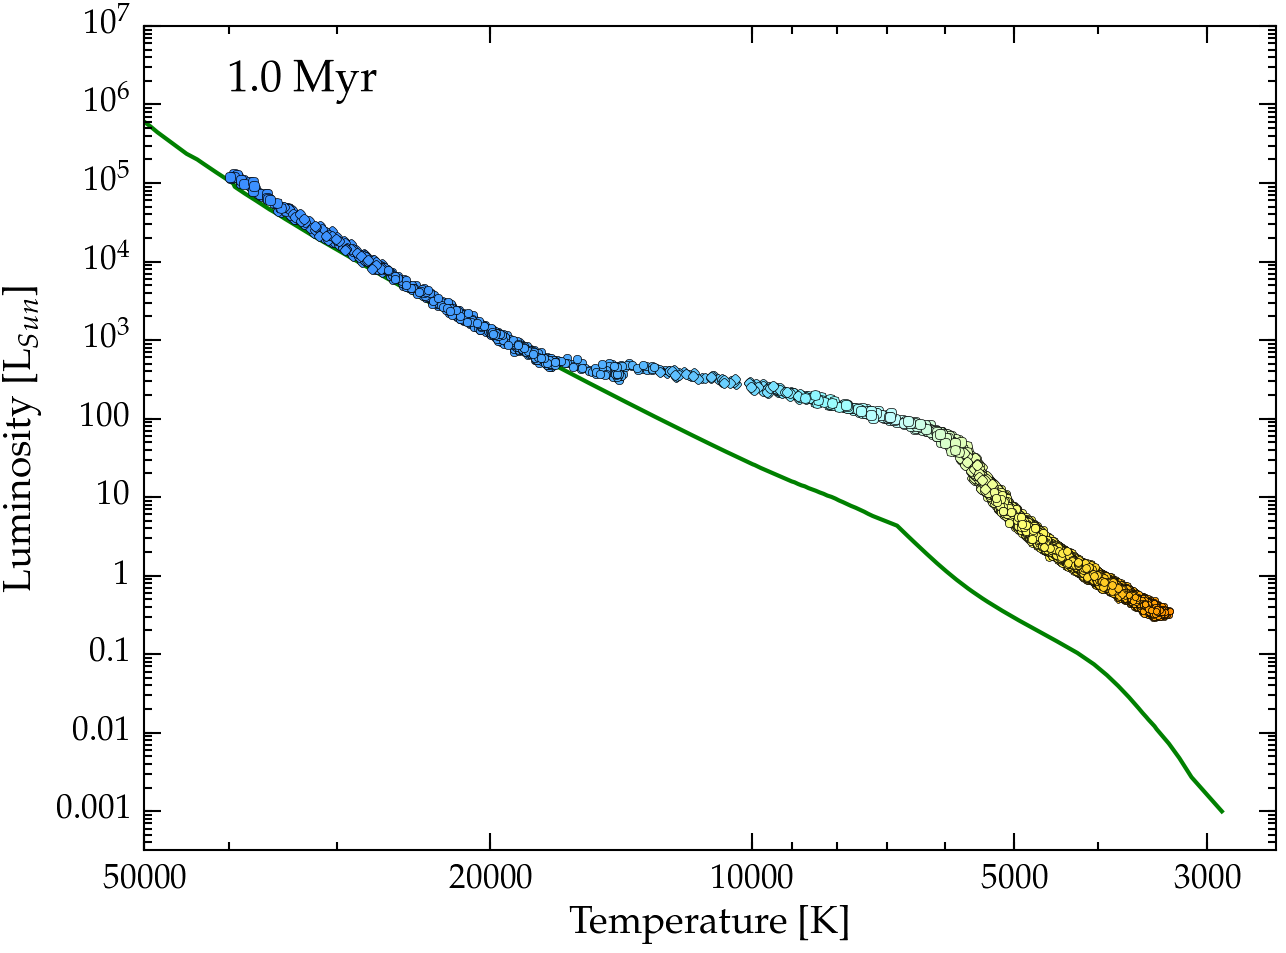 Lecture 21 testing stellar evolution h r diagram t1 myr pooptronica Choice Image